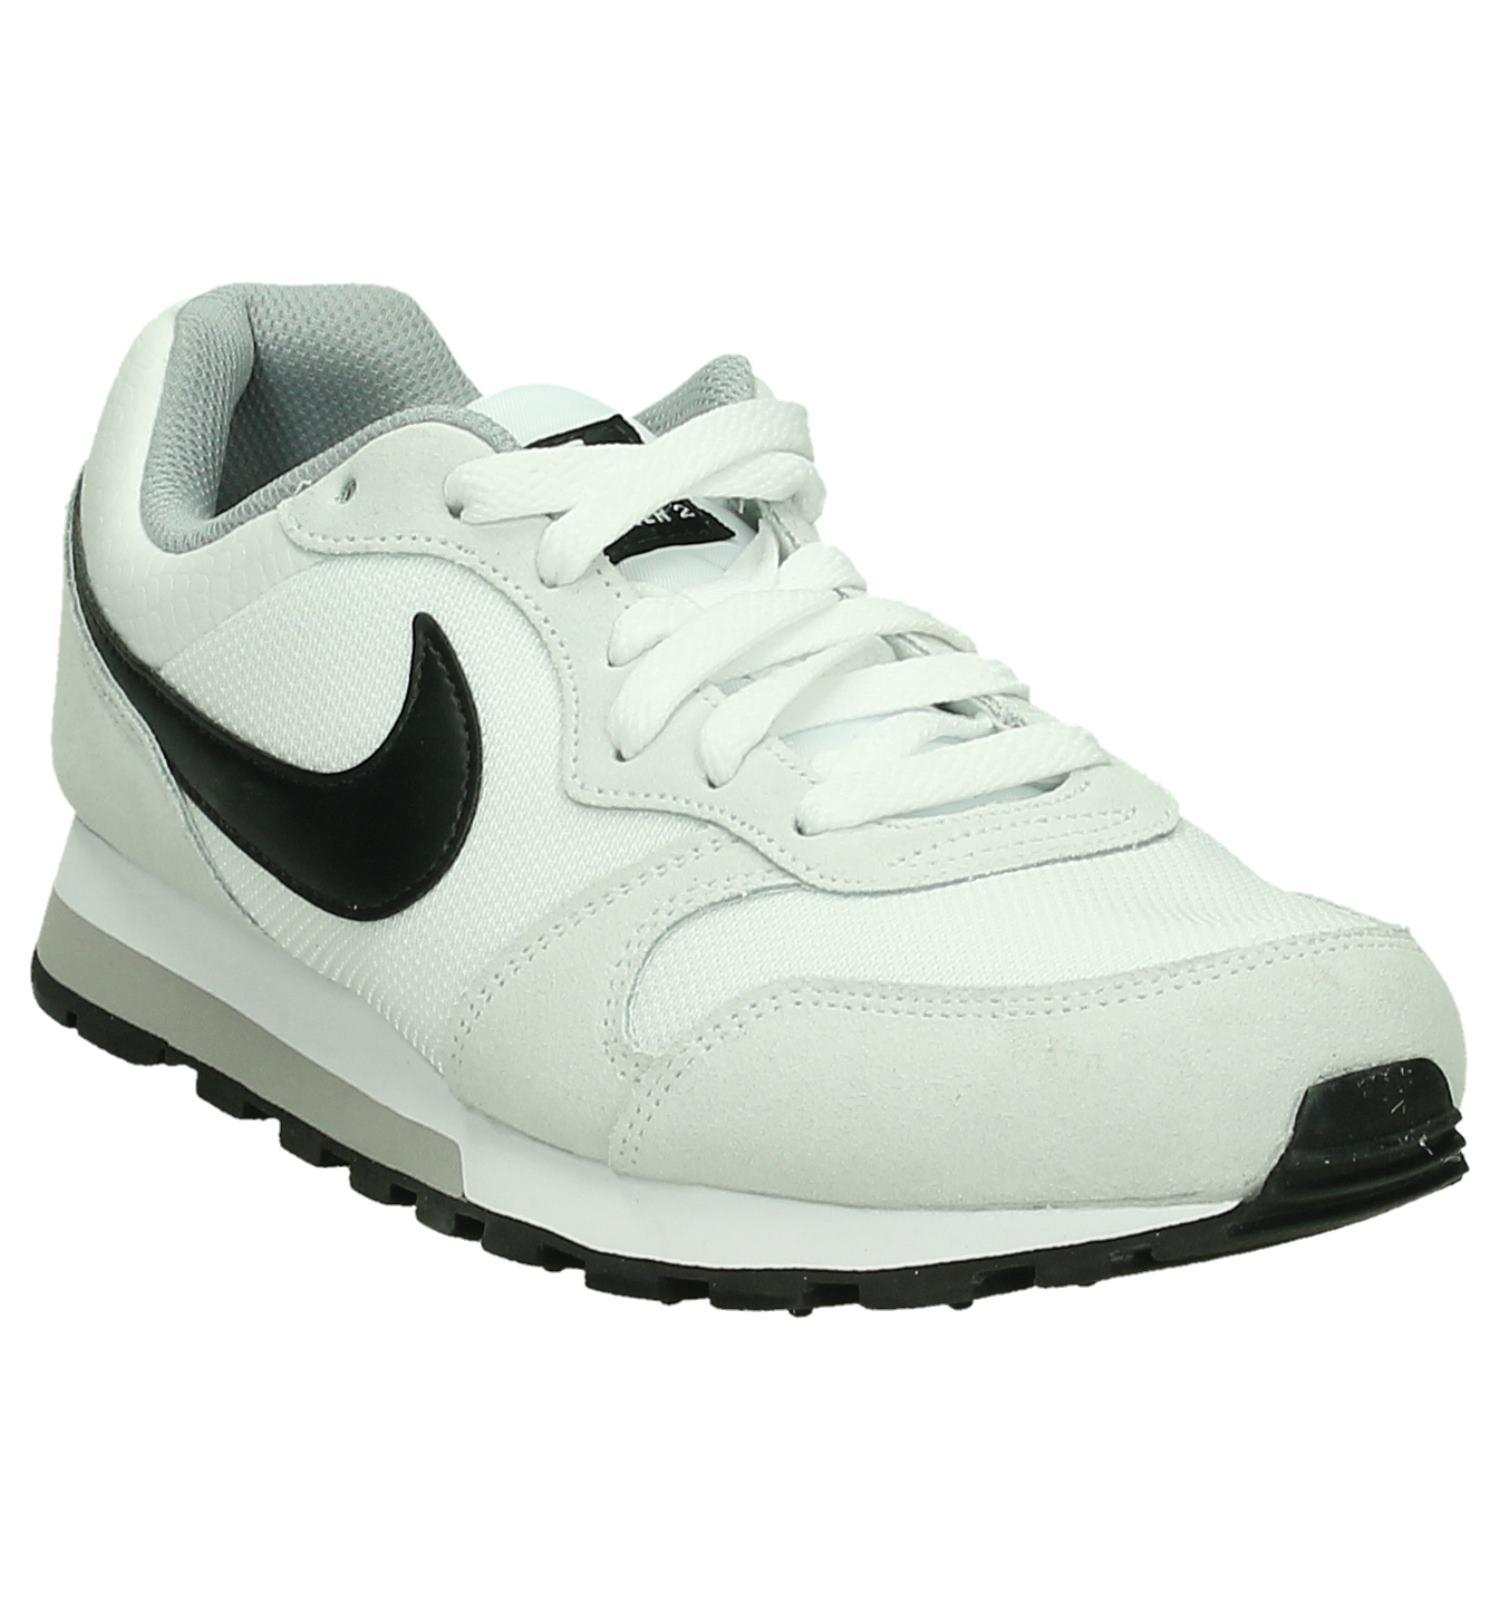 Nike MD Runner 2 dames lage sneakers roze